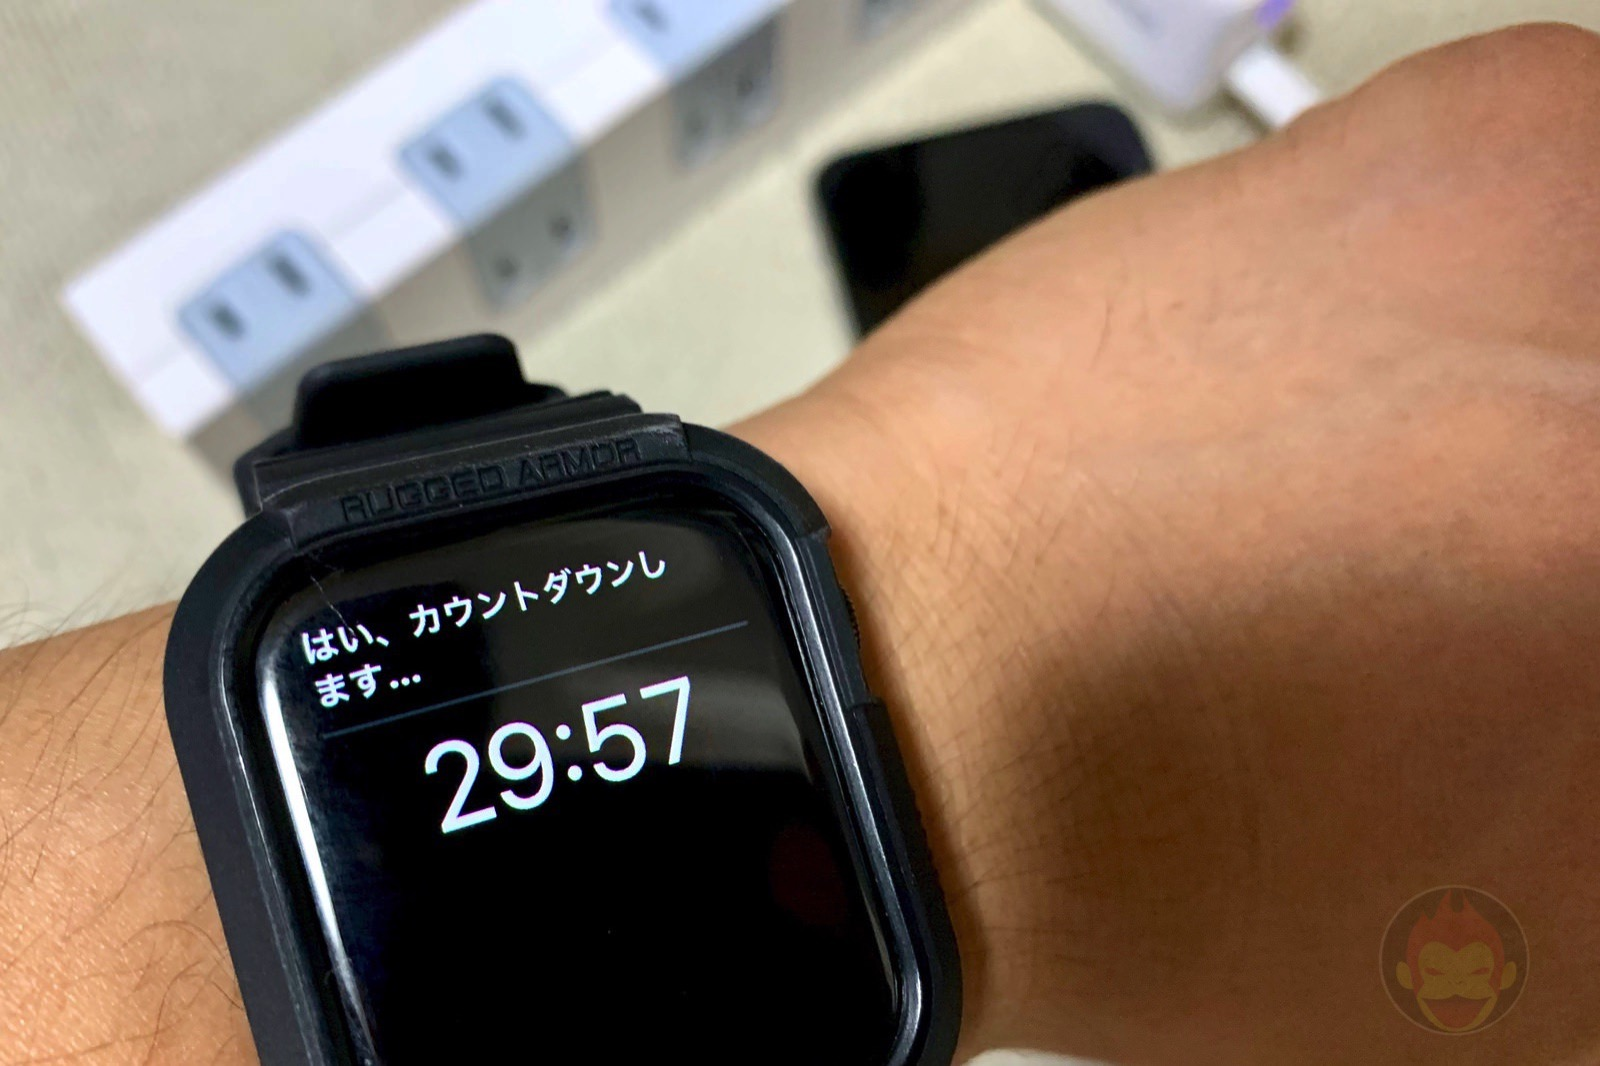 iphone-high-speed-charging-test-02.jpg